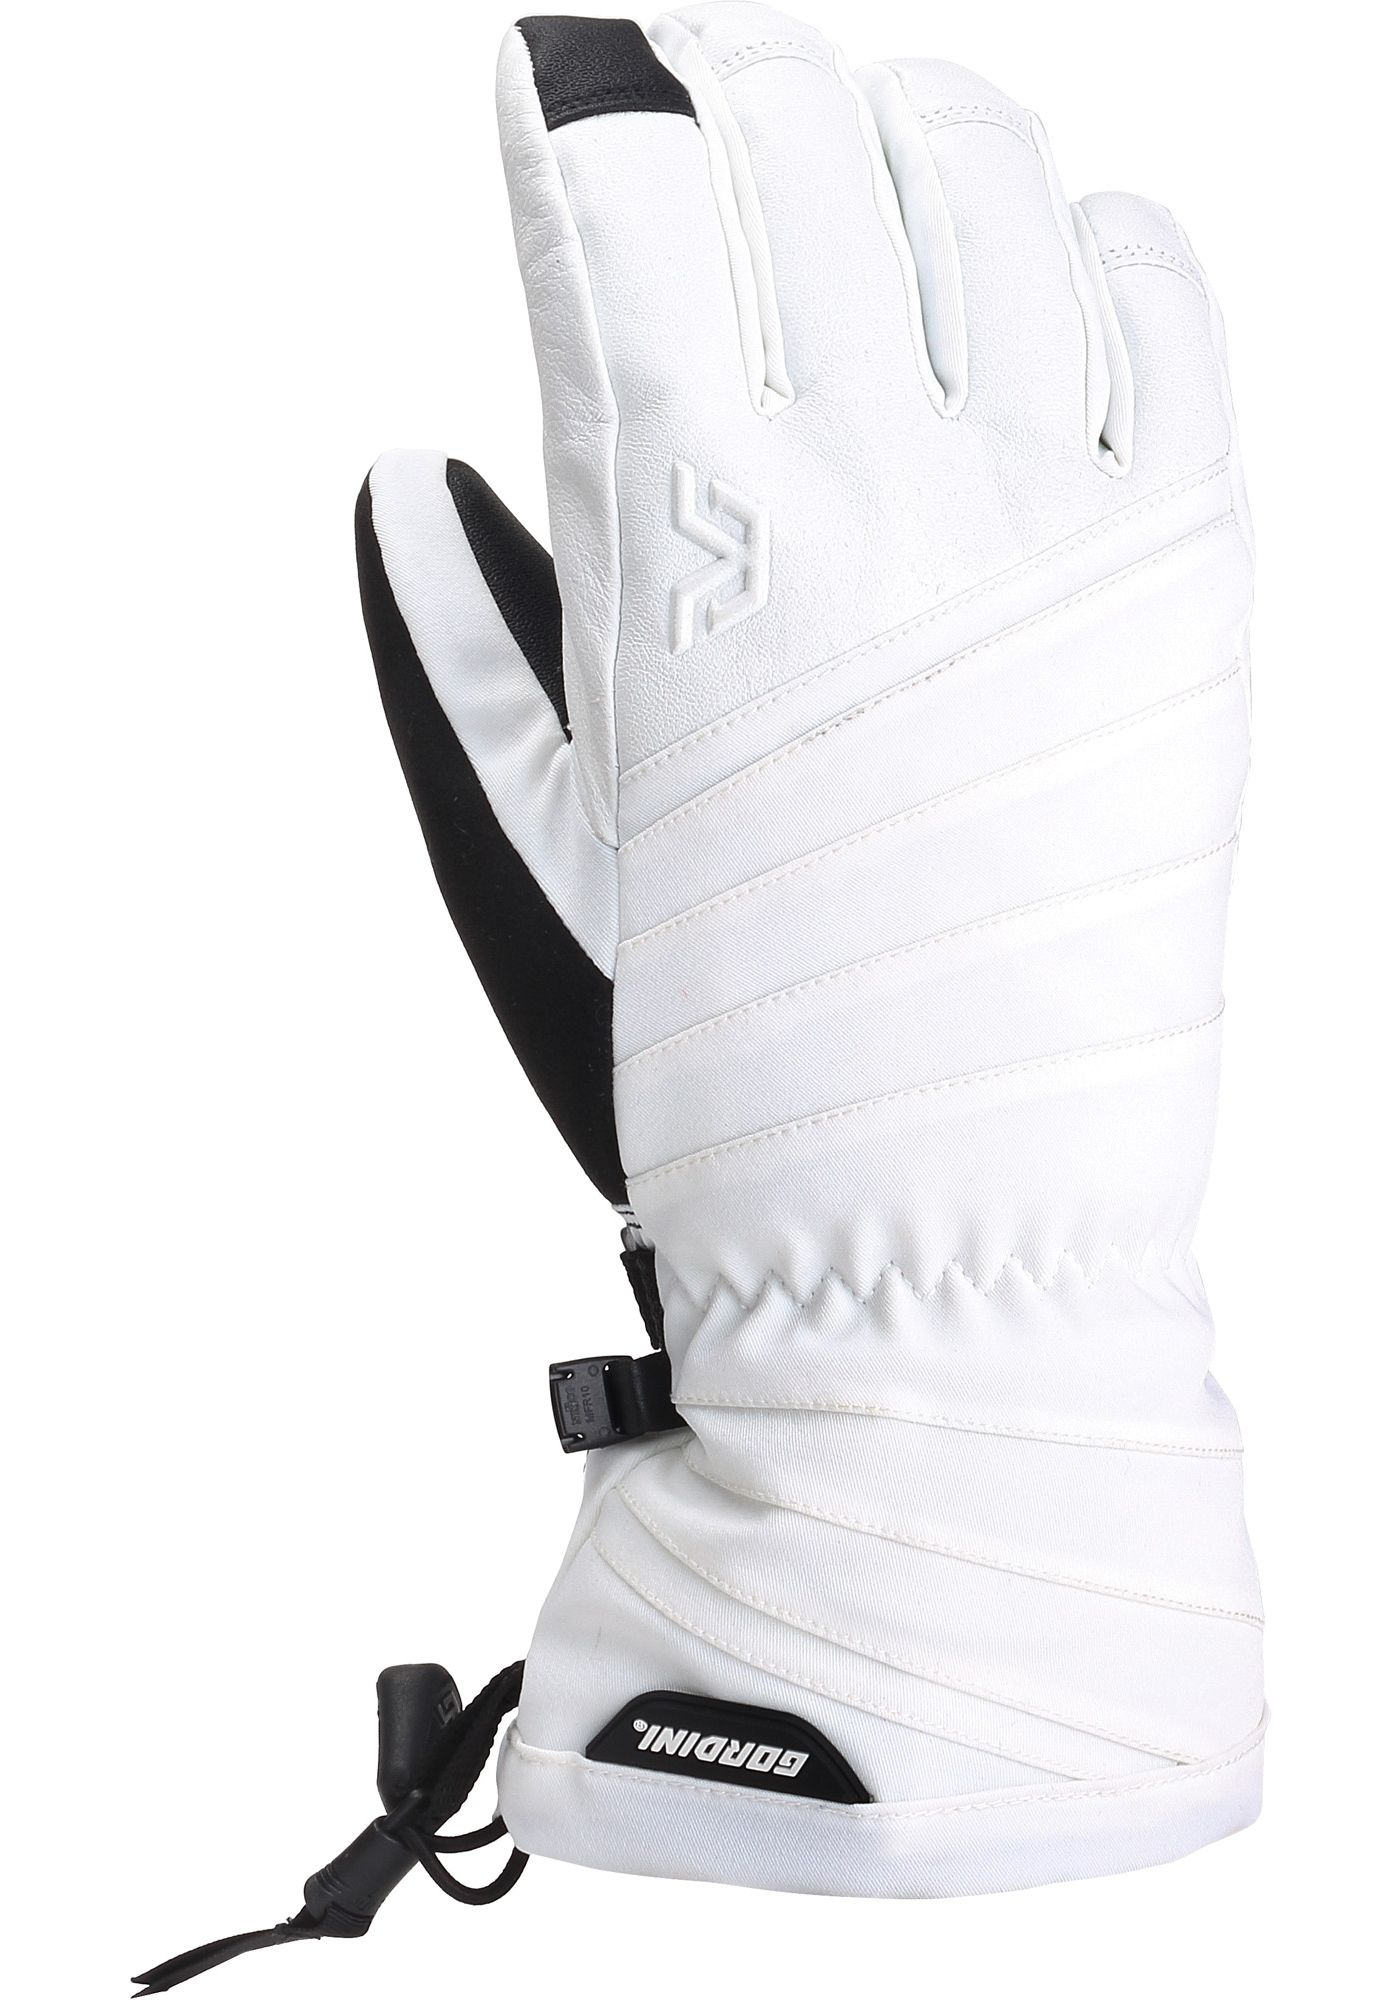 Gordini Women's GORE-TEX Storm Trooper III Gloves